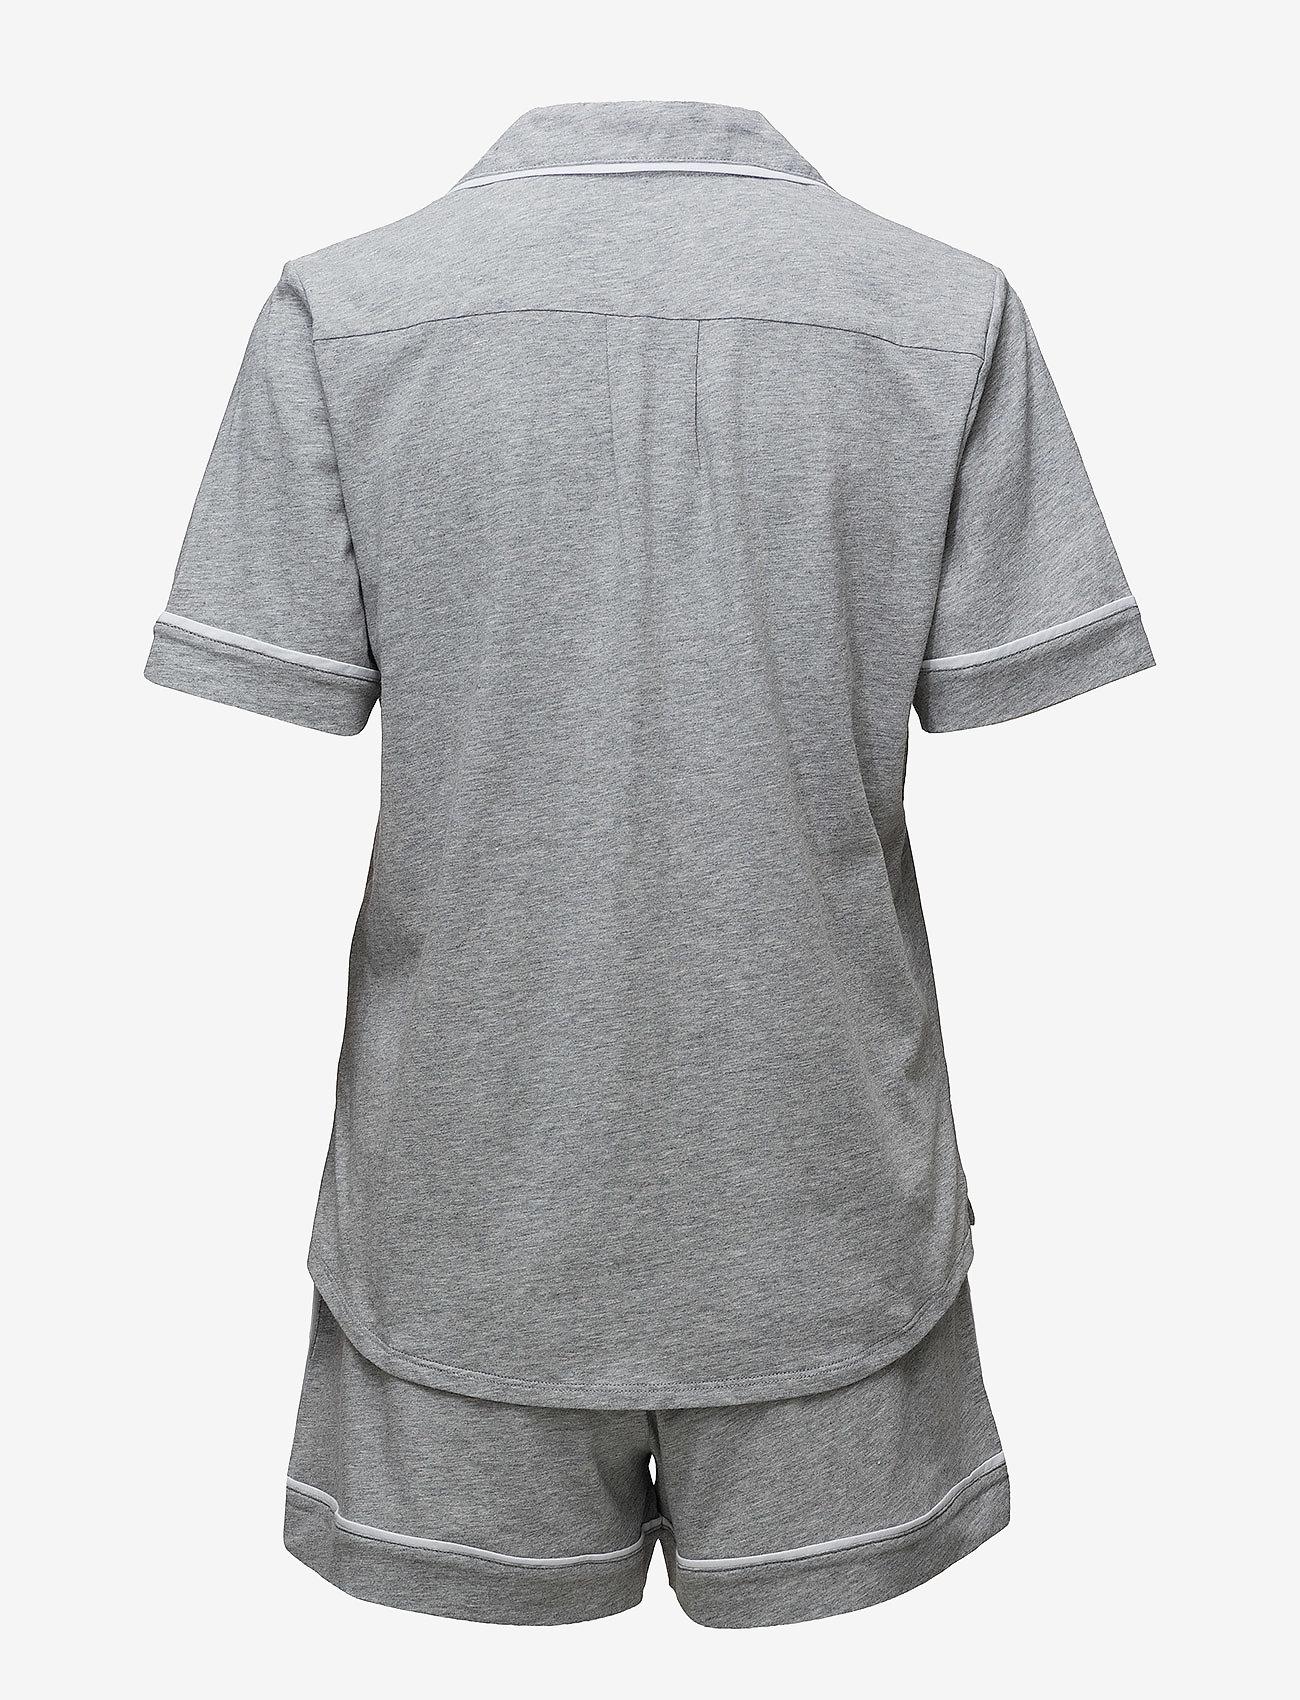 DKNY Homewear - DKNY NEW SIGNATURE S/S TOP & BOXER PJ - pyjama''s - grey heather - 1